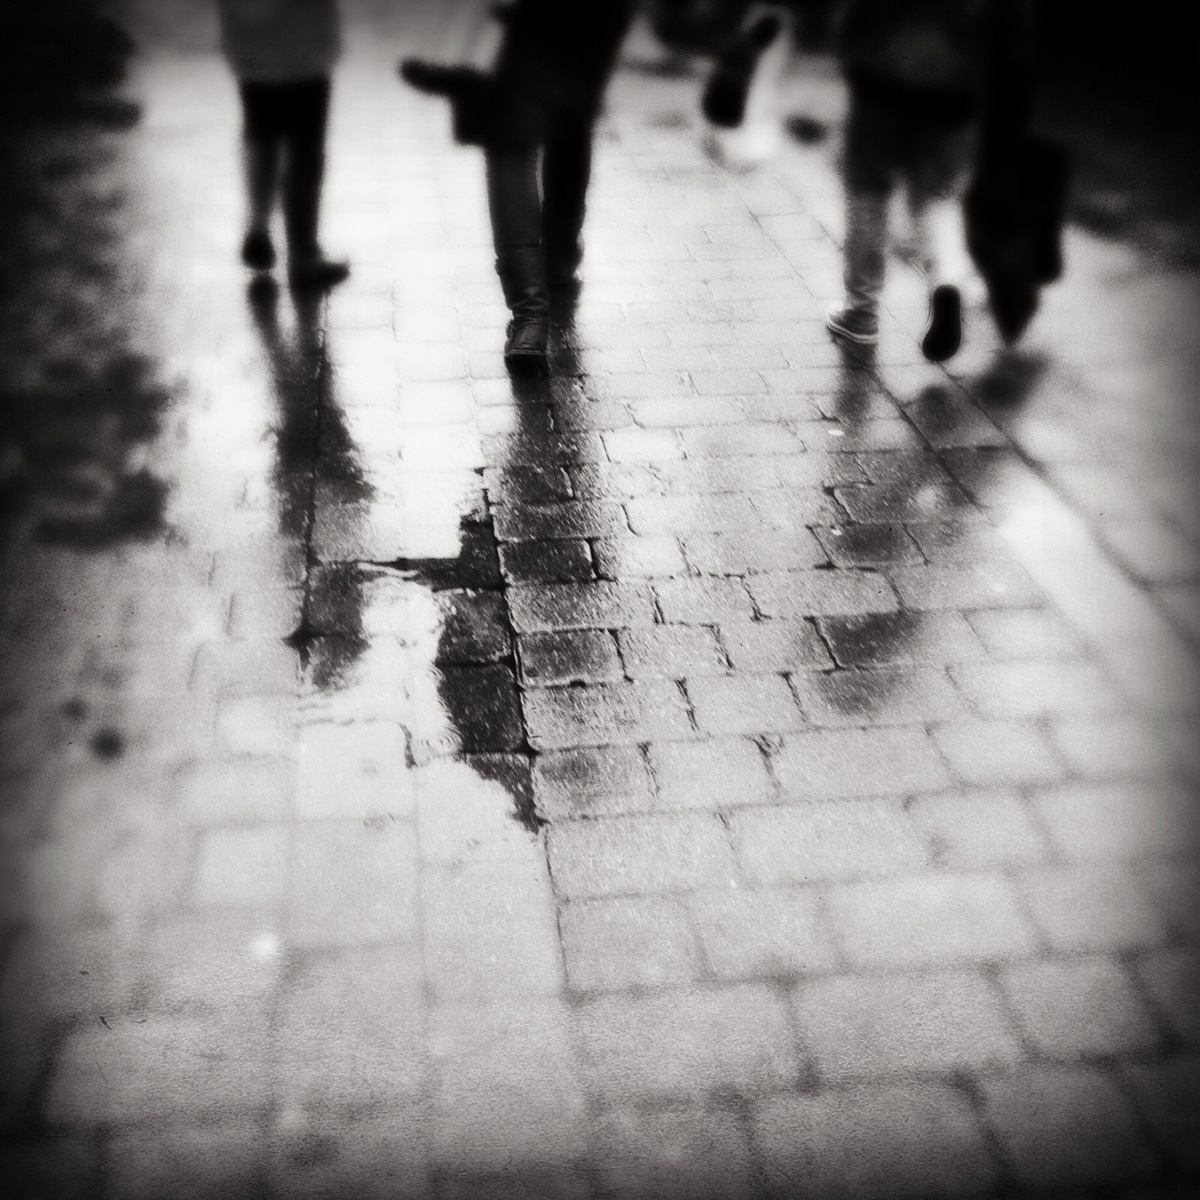 urban-wet-socks